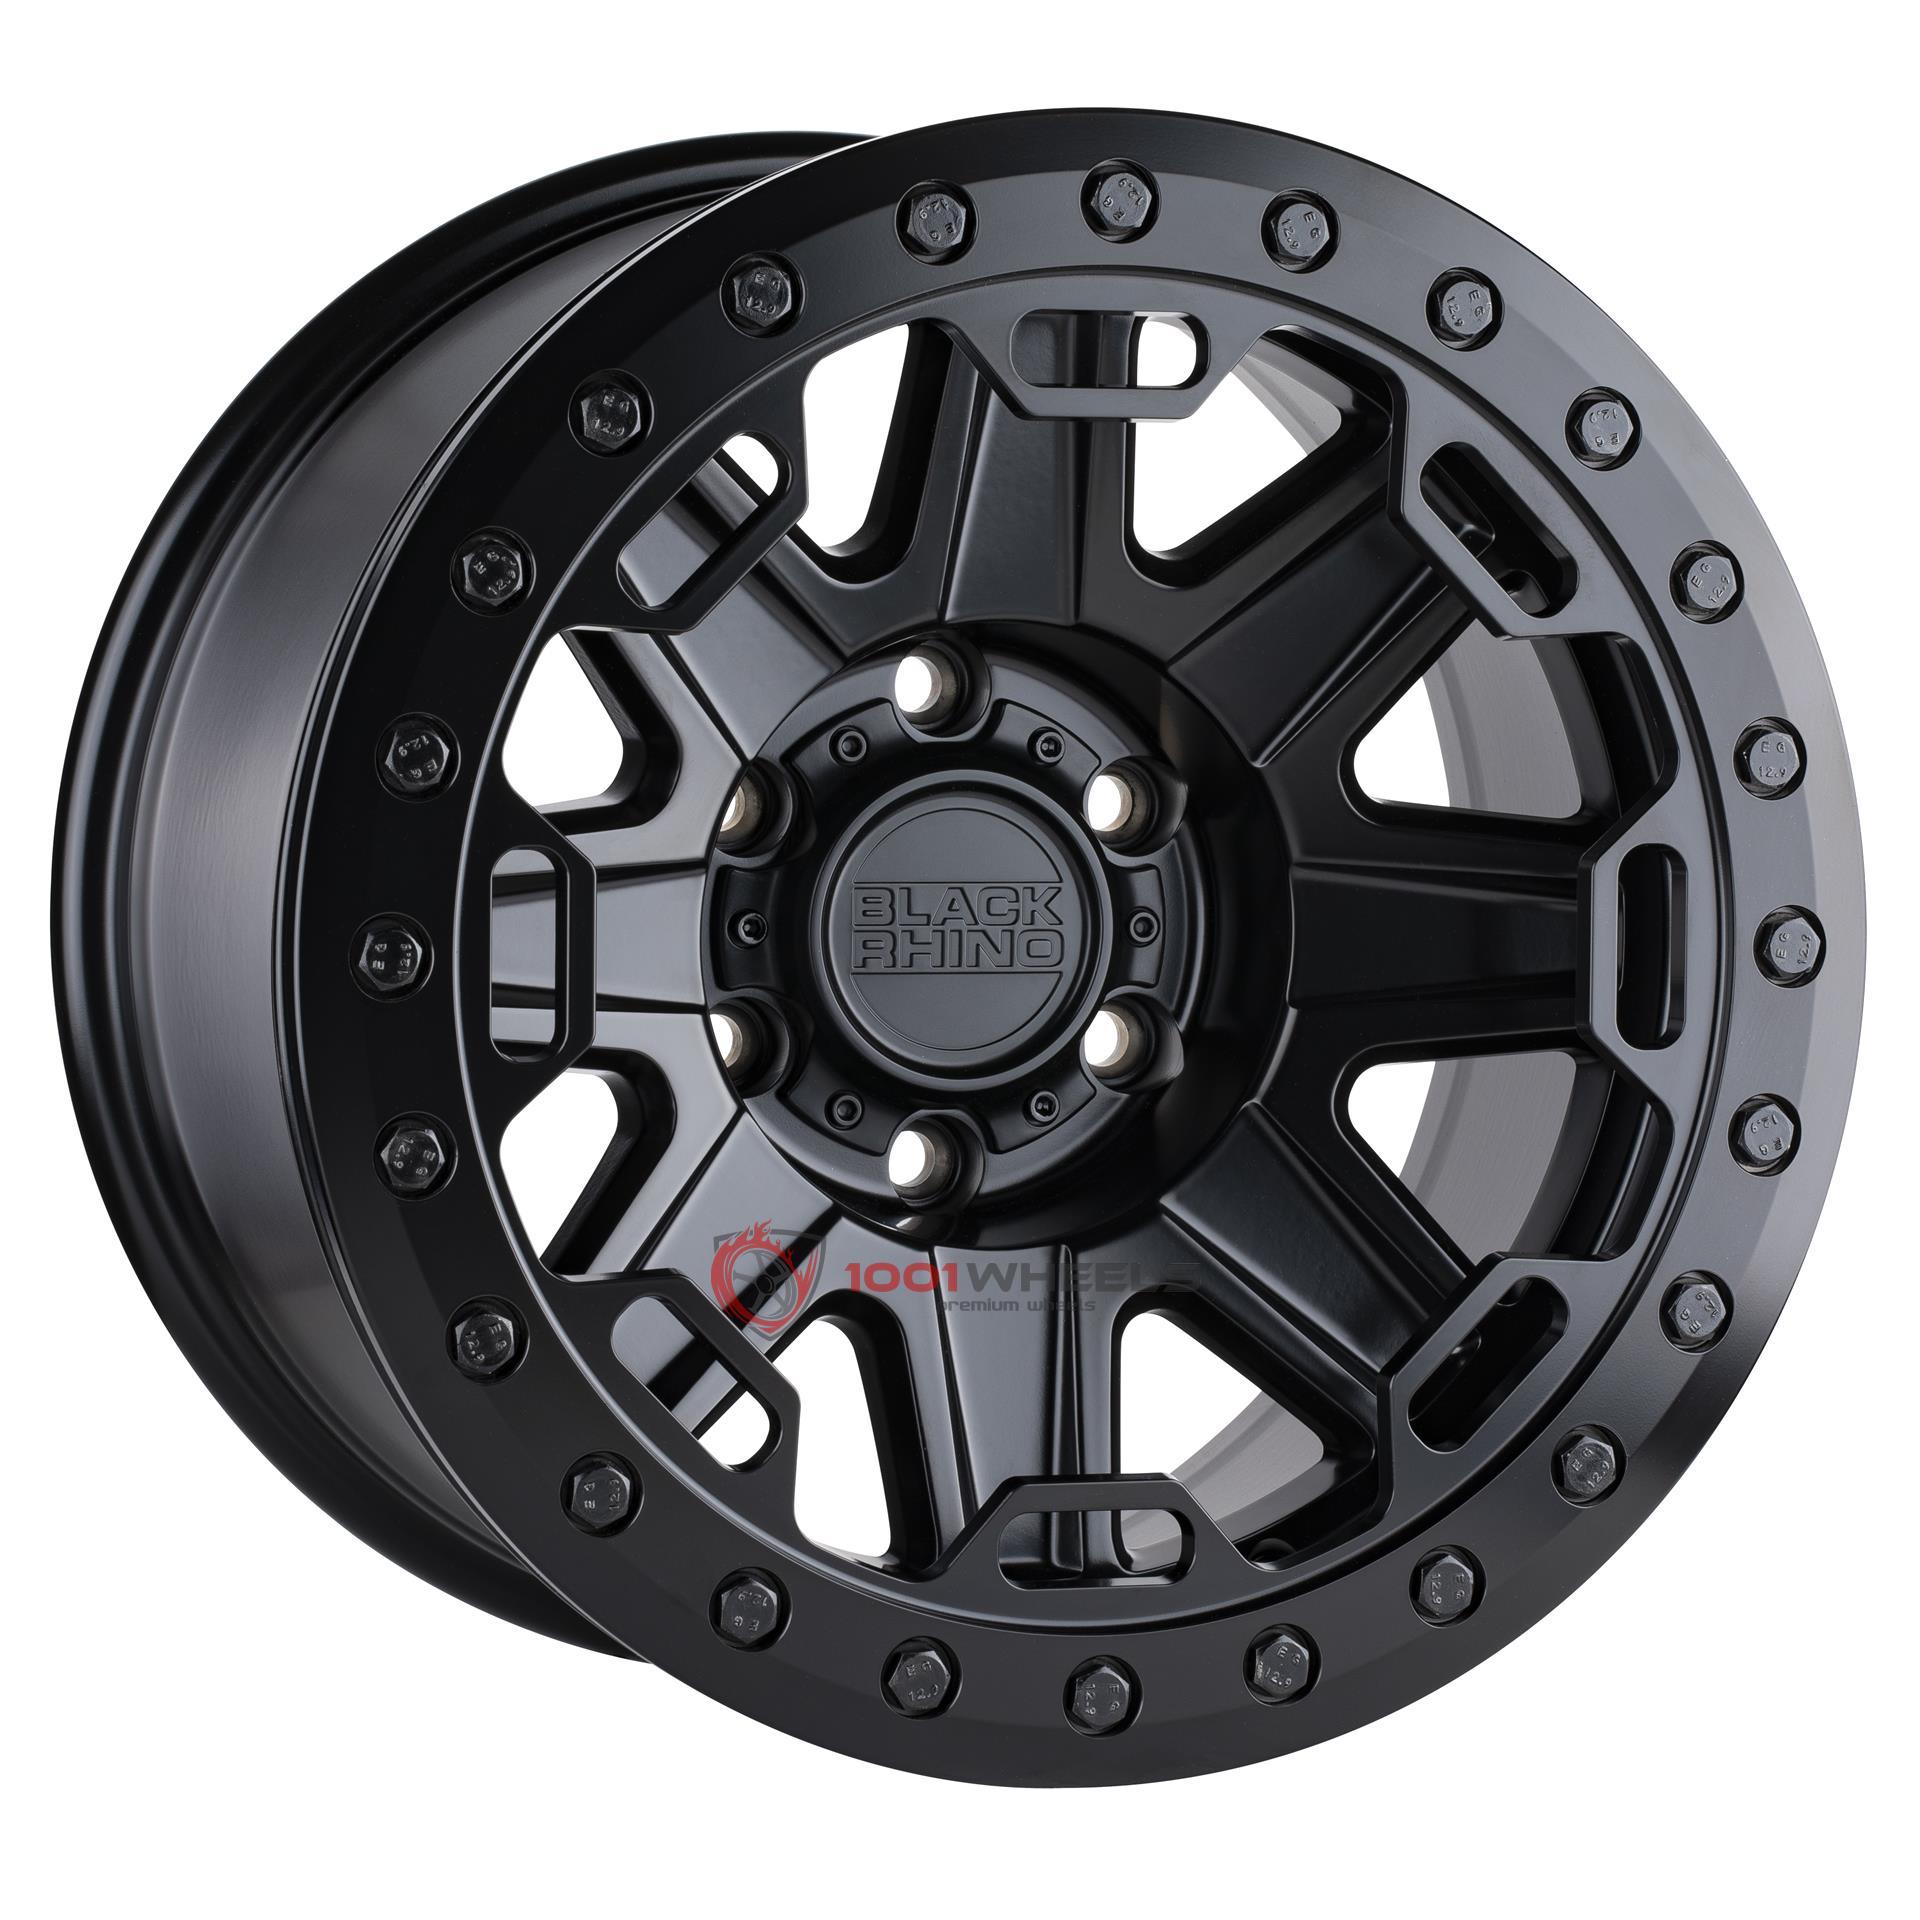 BLACK RHINO RIFT BEADLOCK matte-black-wblack-bolts